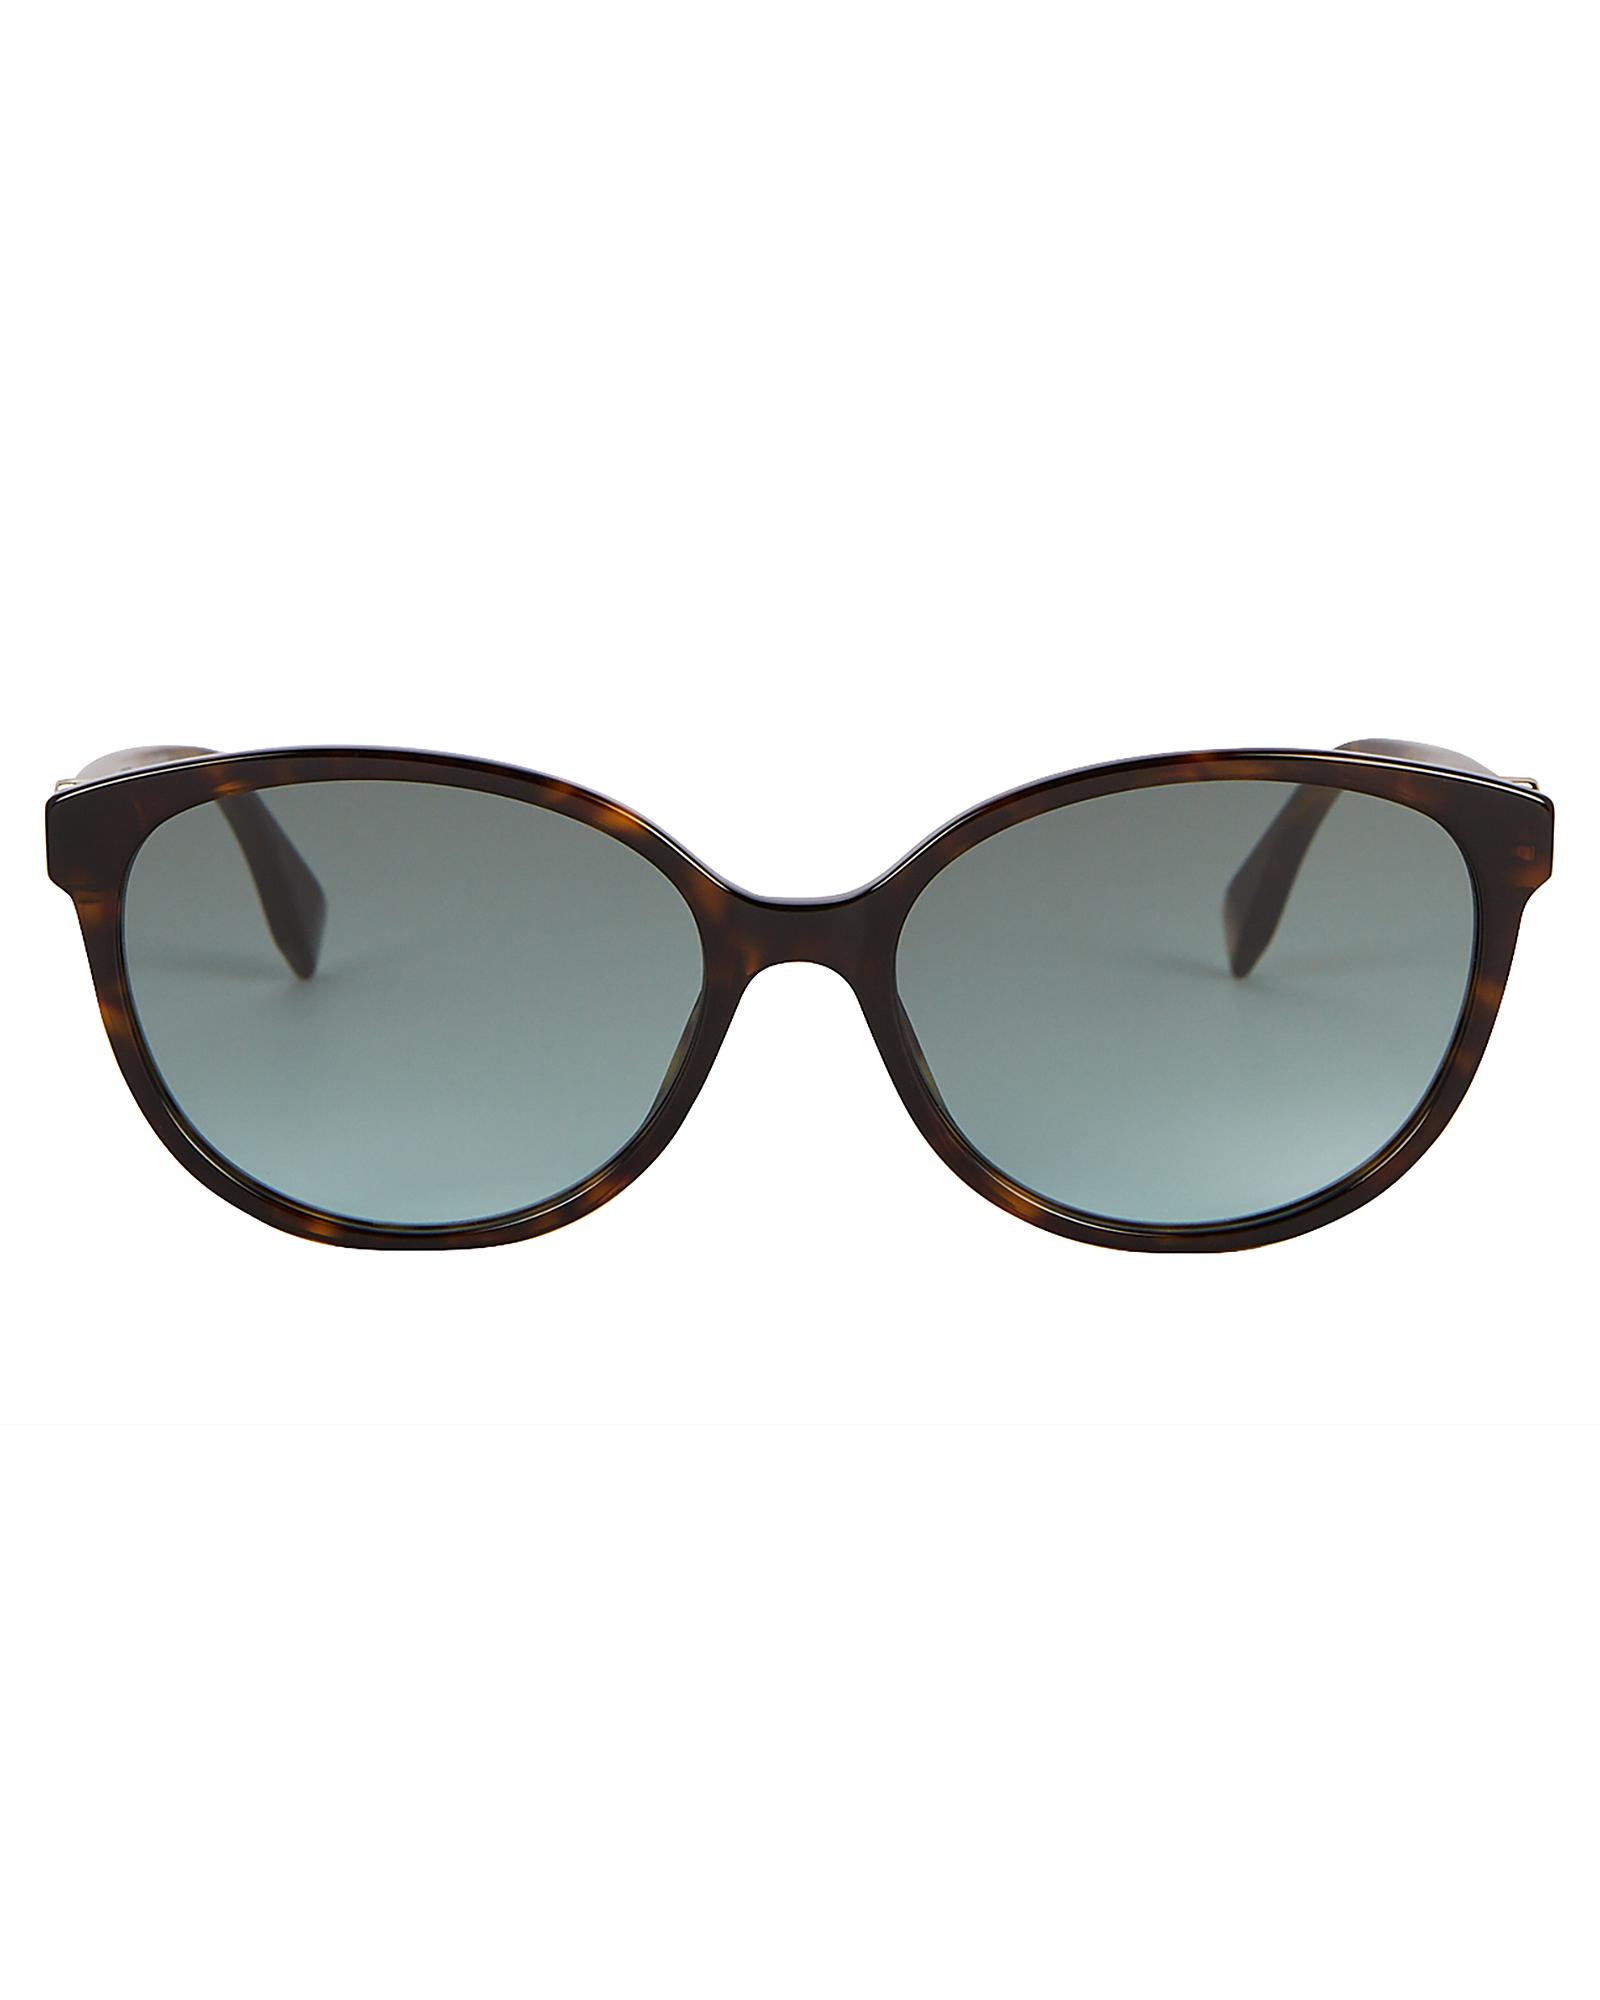 Fendi Sunglasses FENDI HAVANA CAT EYE SUNGLASSES